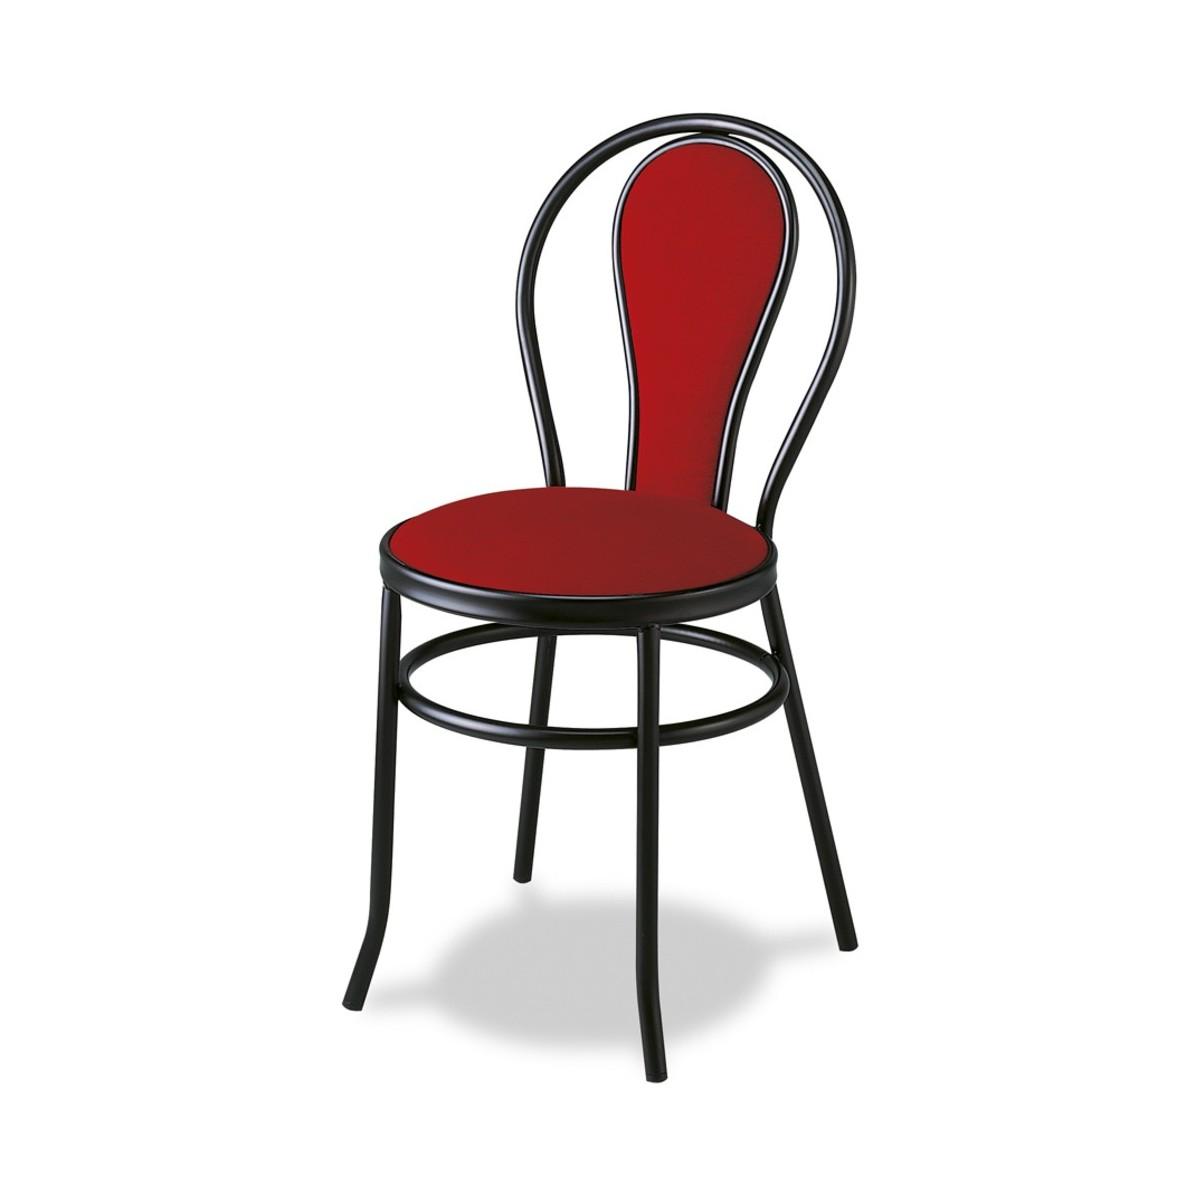 Silla para bar tapizado asiento y respaldo en skay o - Sillas para bares ...